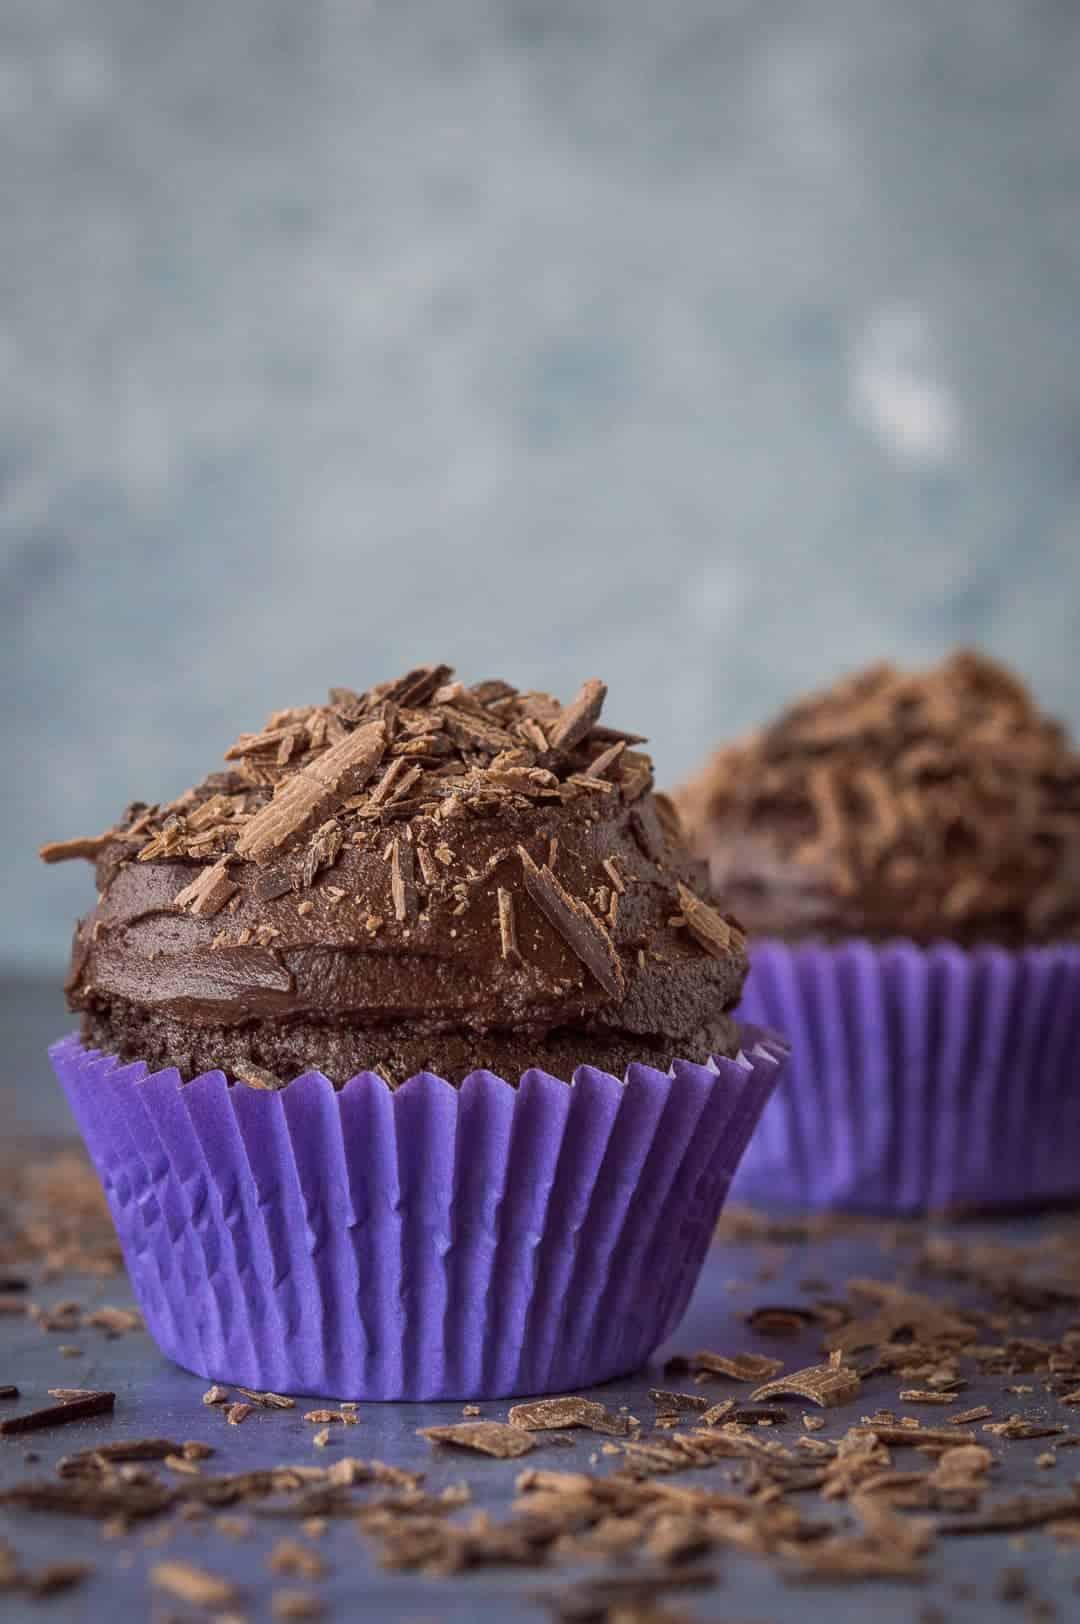 Two vegan chocolate cupcakes in purple cake cases.